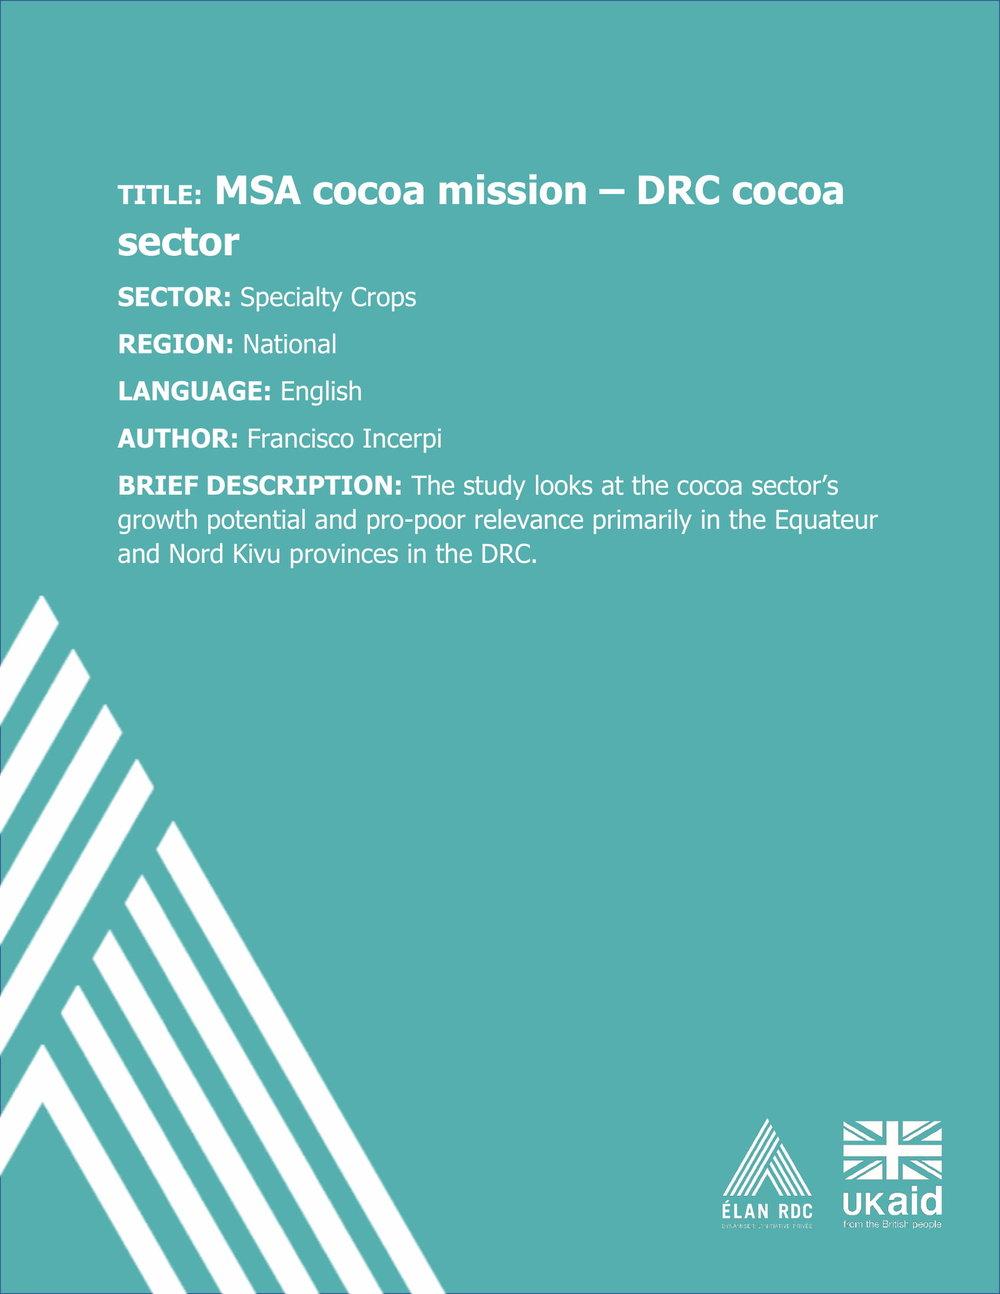 Coversheet template - SpCr_MSA cocoa-1.jpg